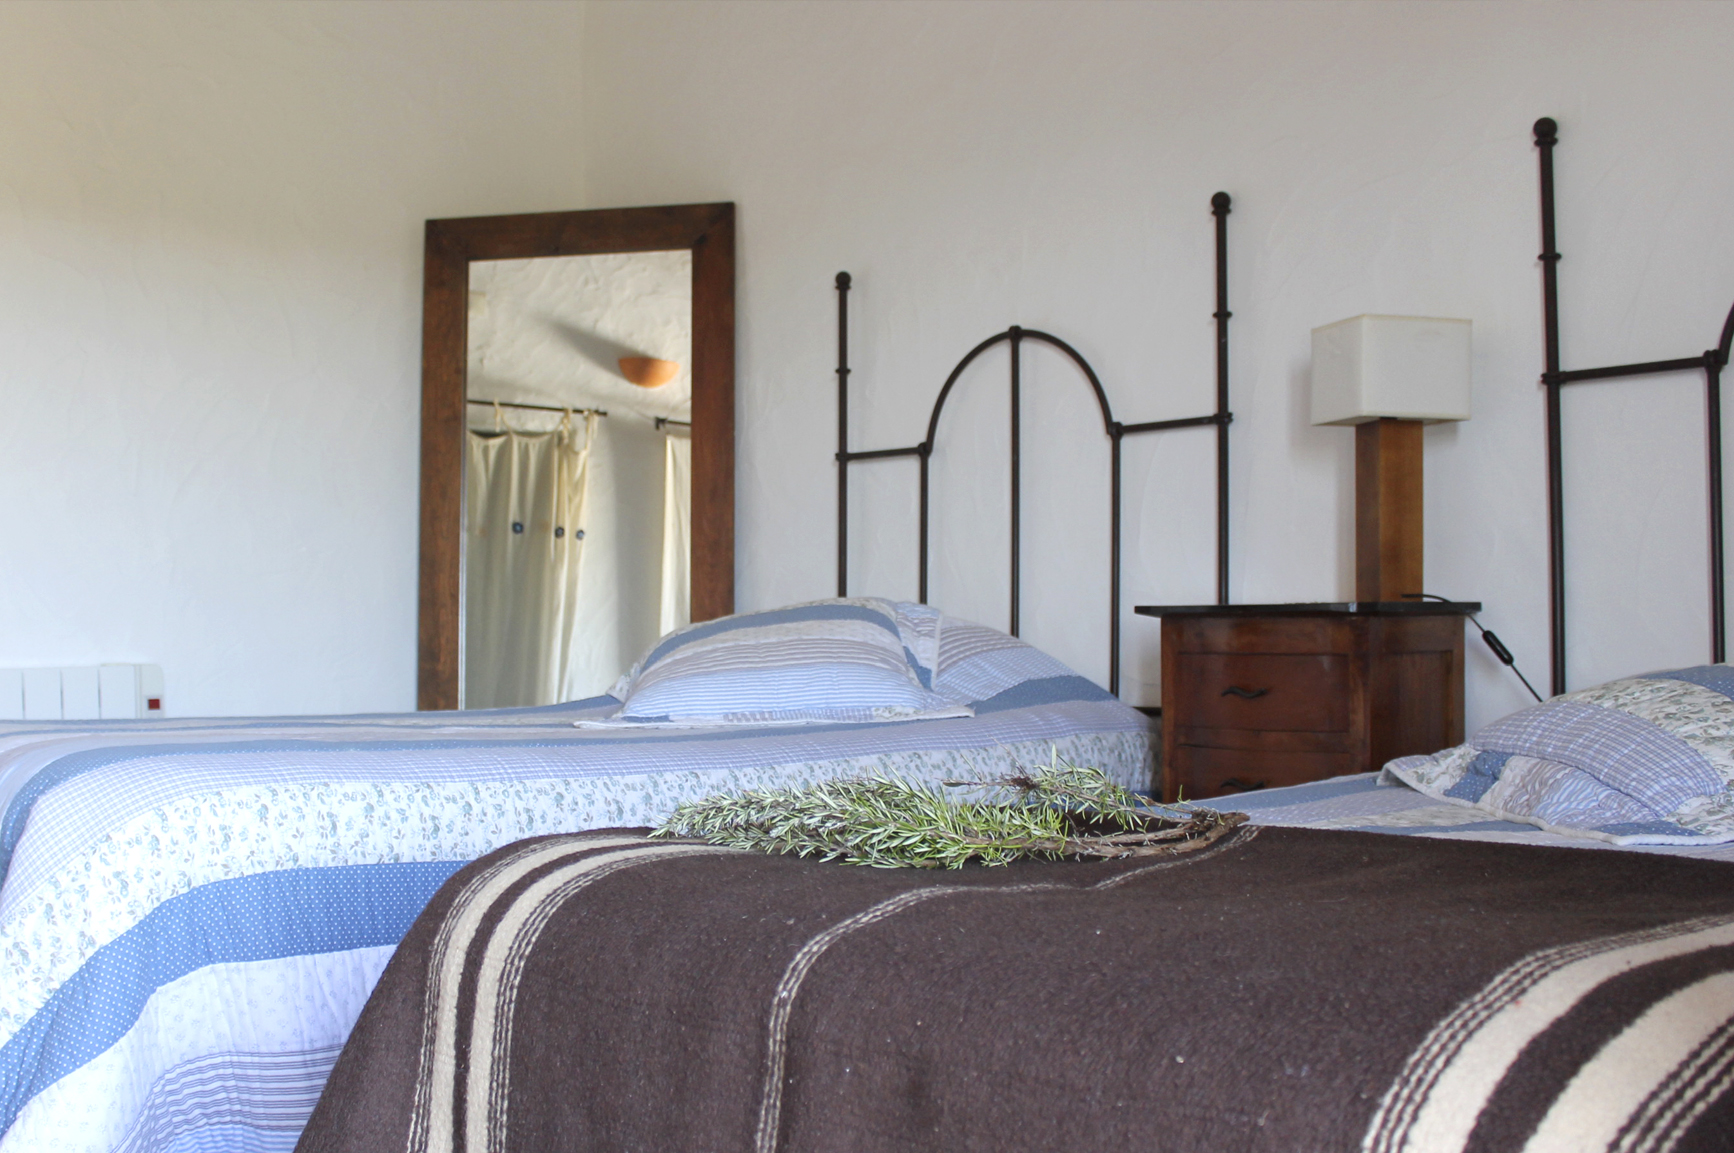 Hotel bed with bathrobe